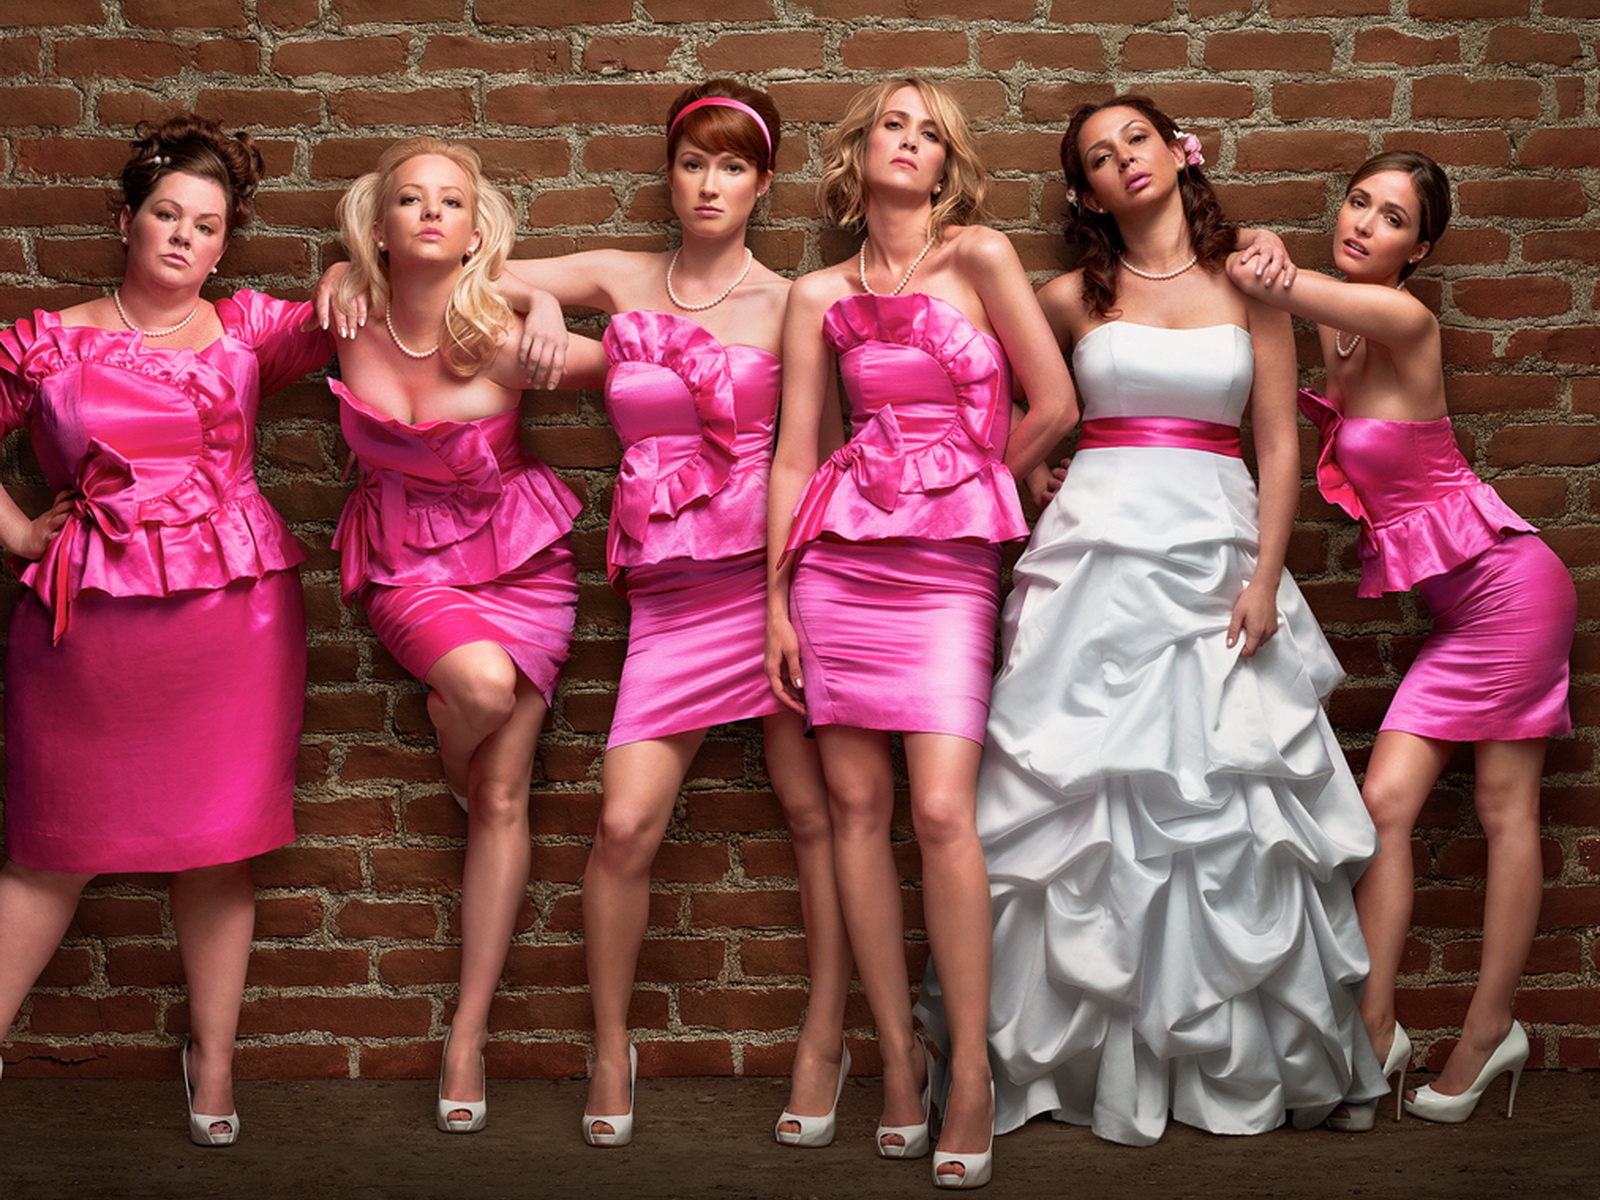 El glamour de Margo: Damas en guerra (Bridesmaids, 2011) de Paul Feig